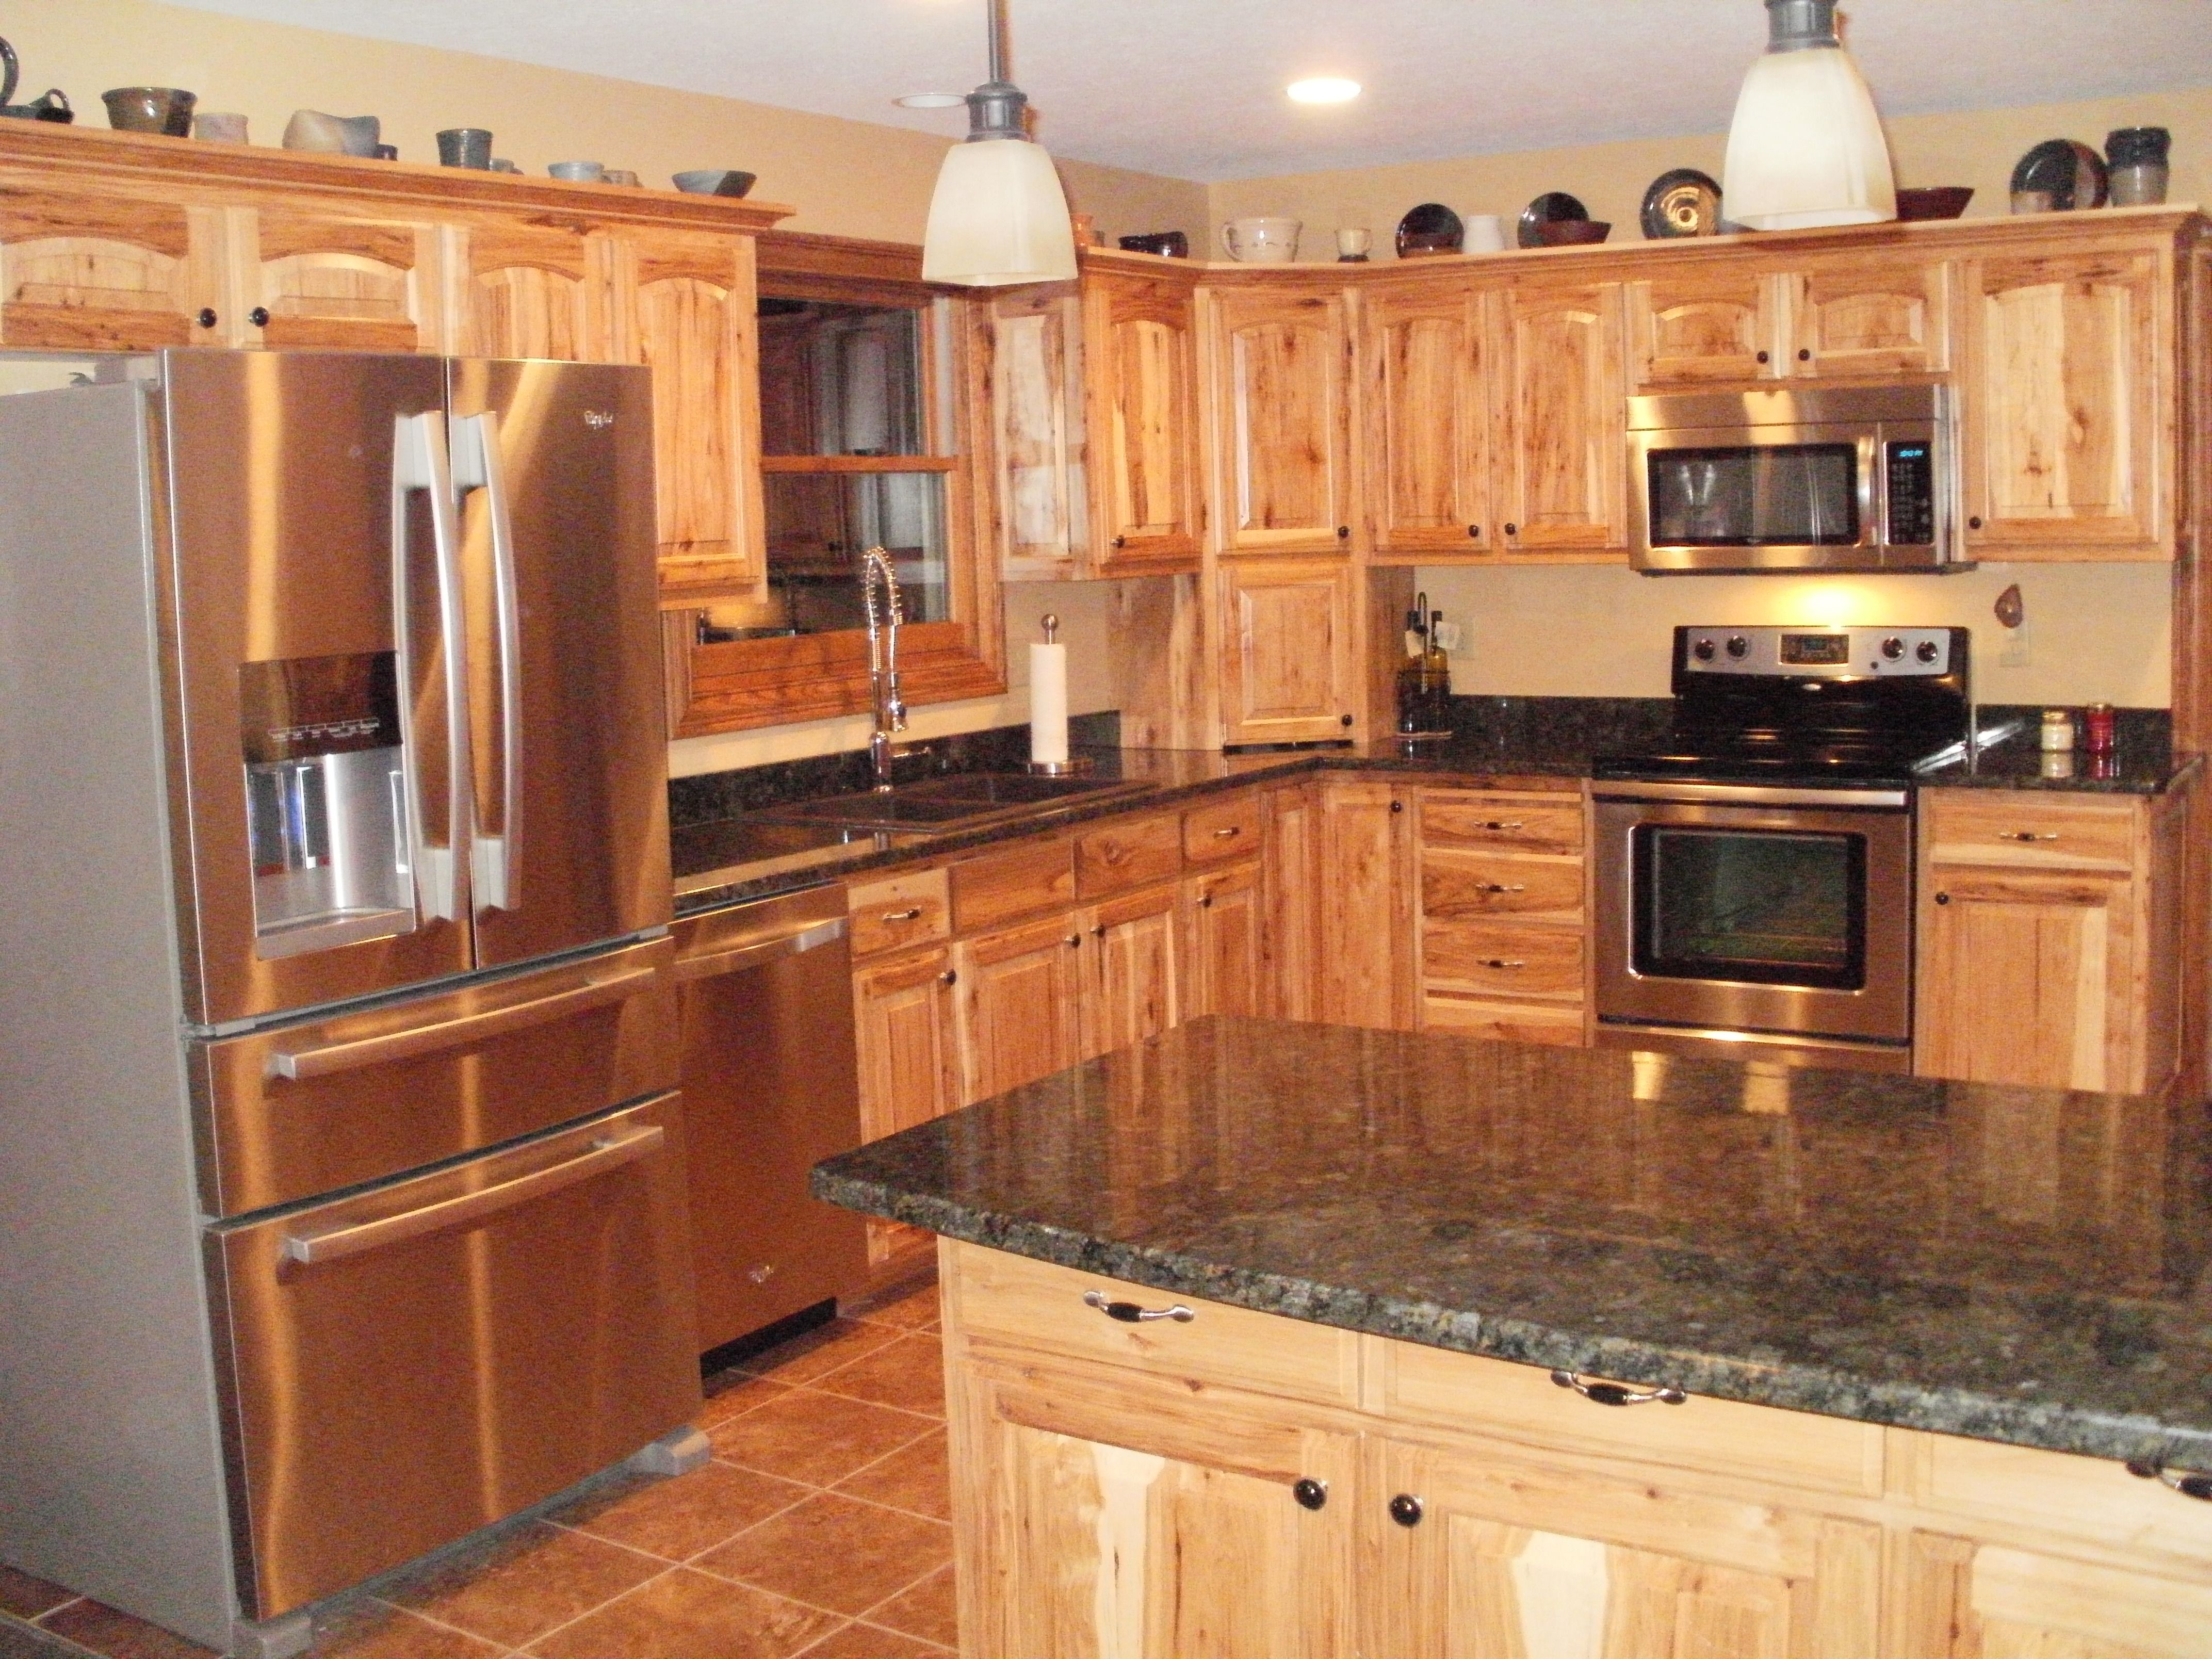 hickory kitchen cabinets island lighting ideas assembled 43hickory 43kitchen 43cabinets